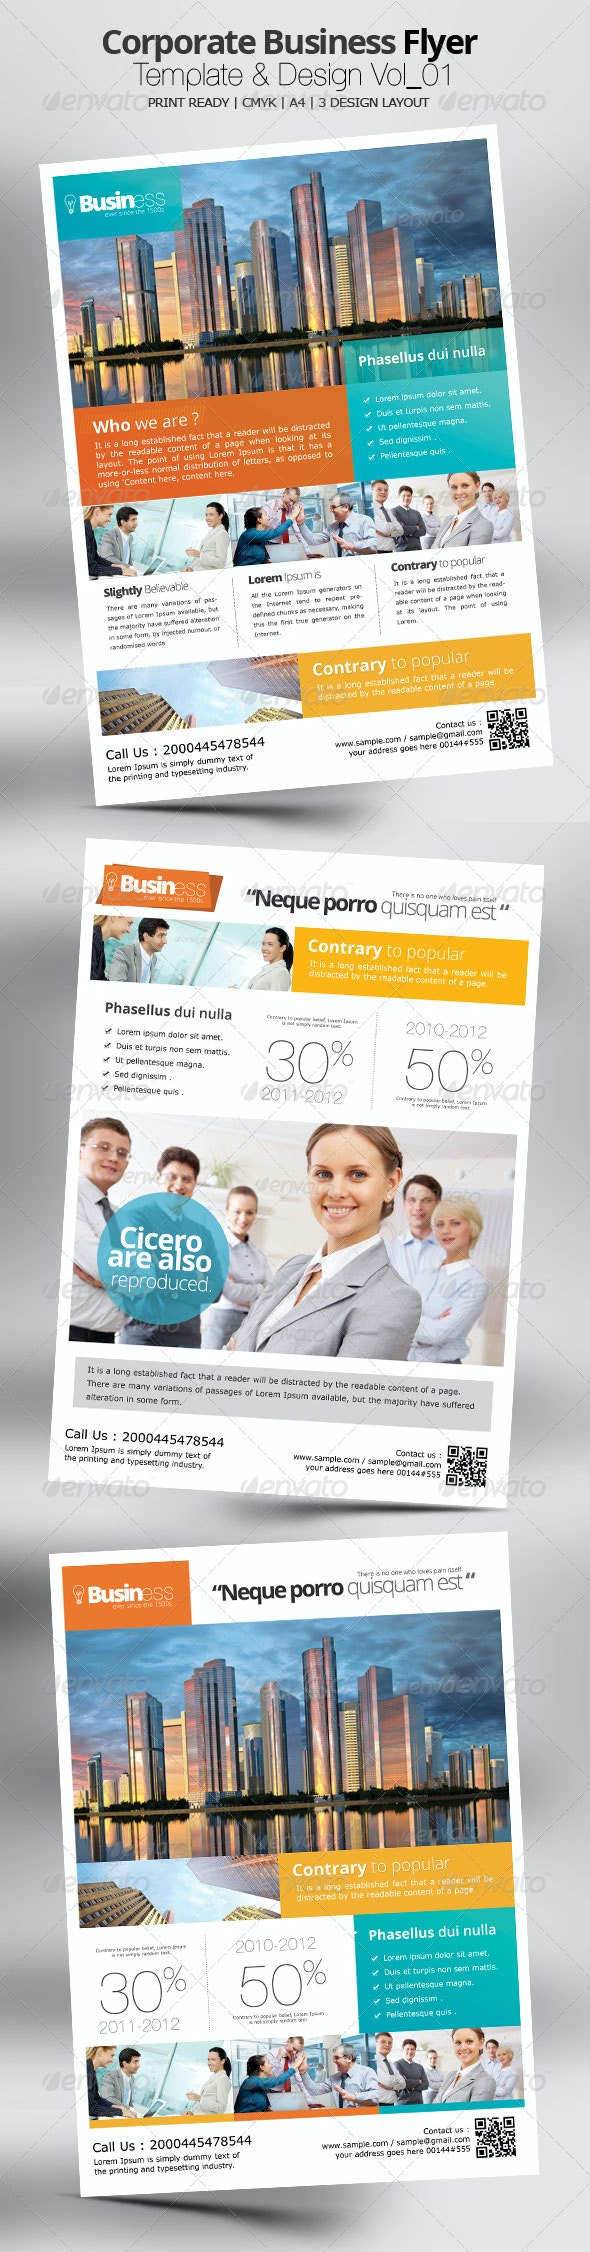 Corporate Business Flyer Template & Design Vol_01 - Corporate Flyers